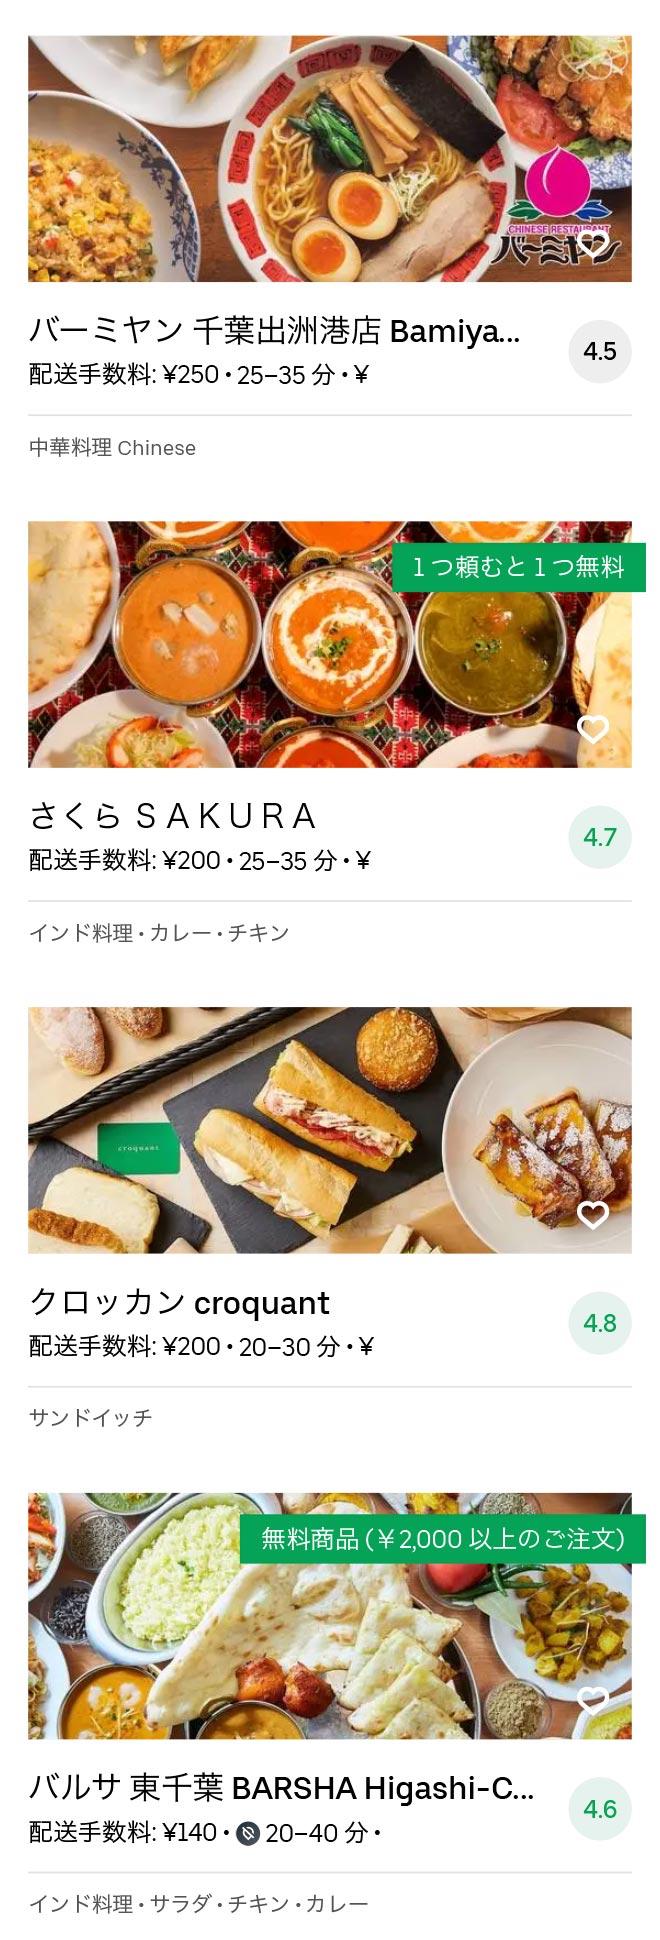 Chiba menu 2010 08